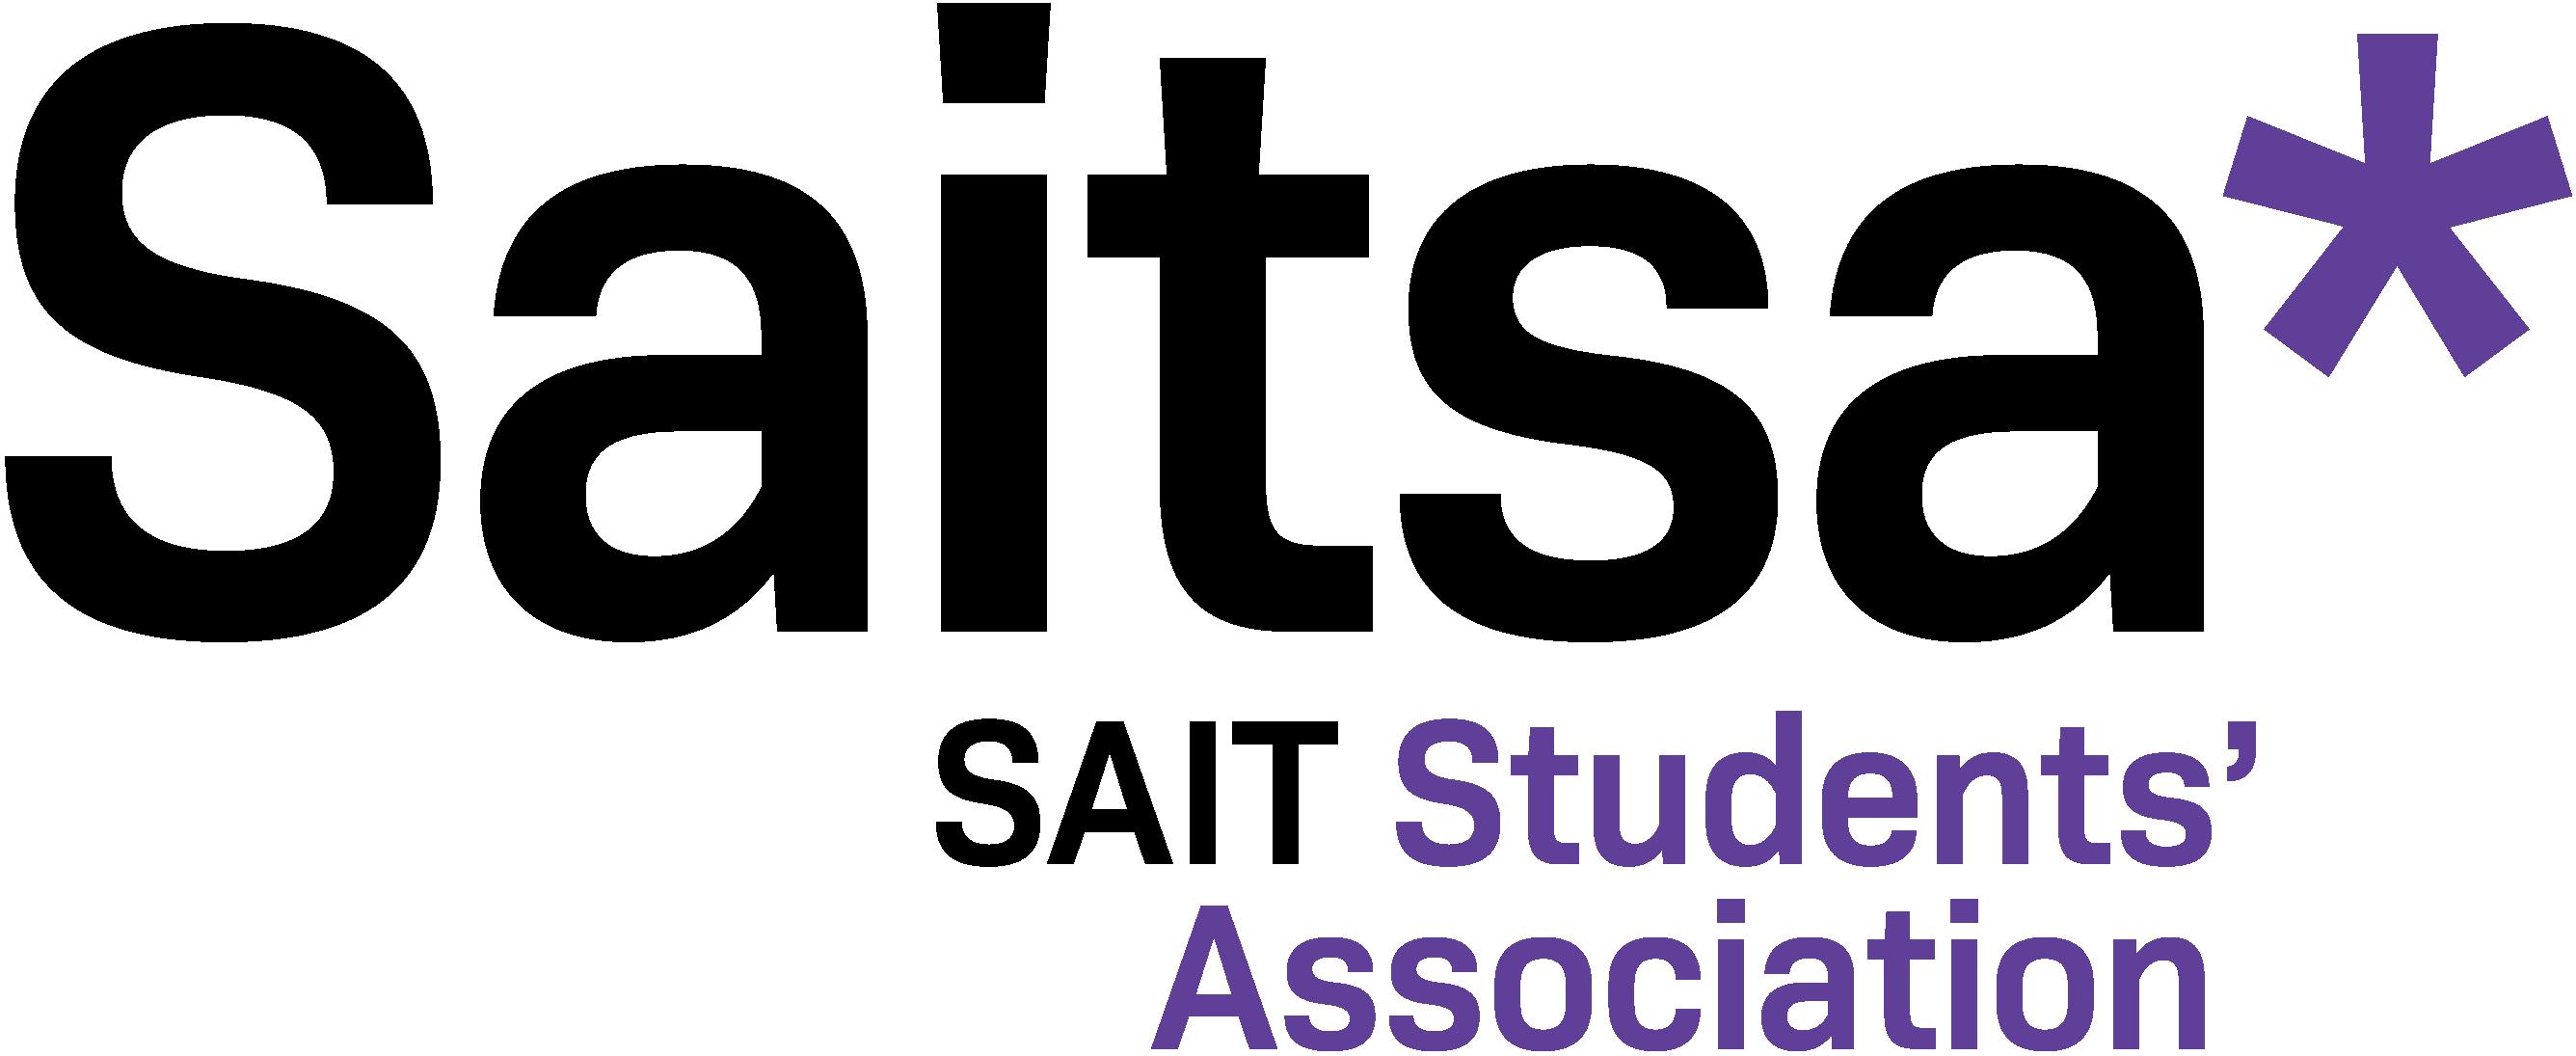 SAITSA Logo